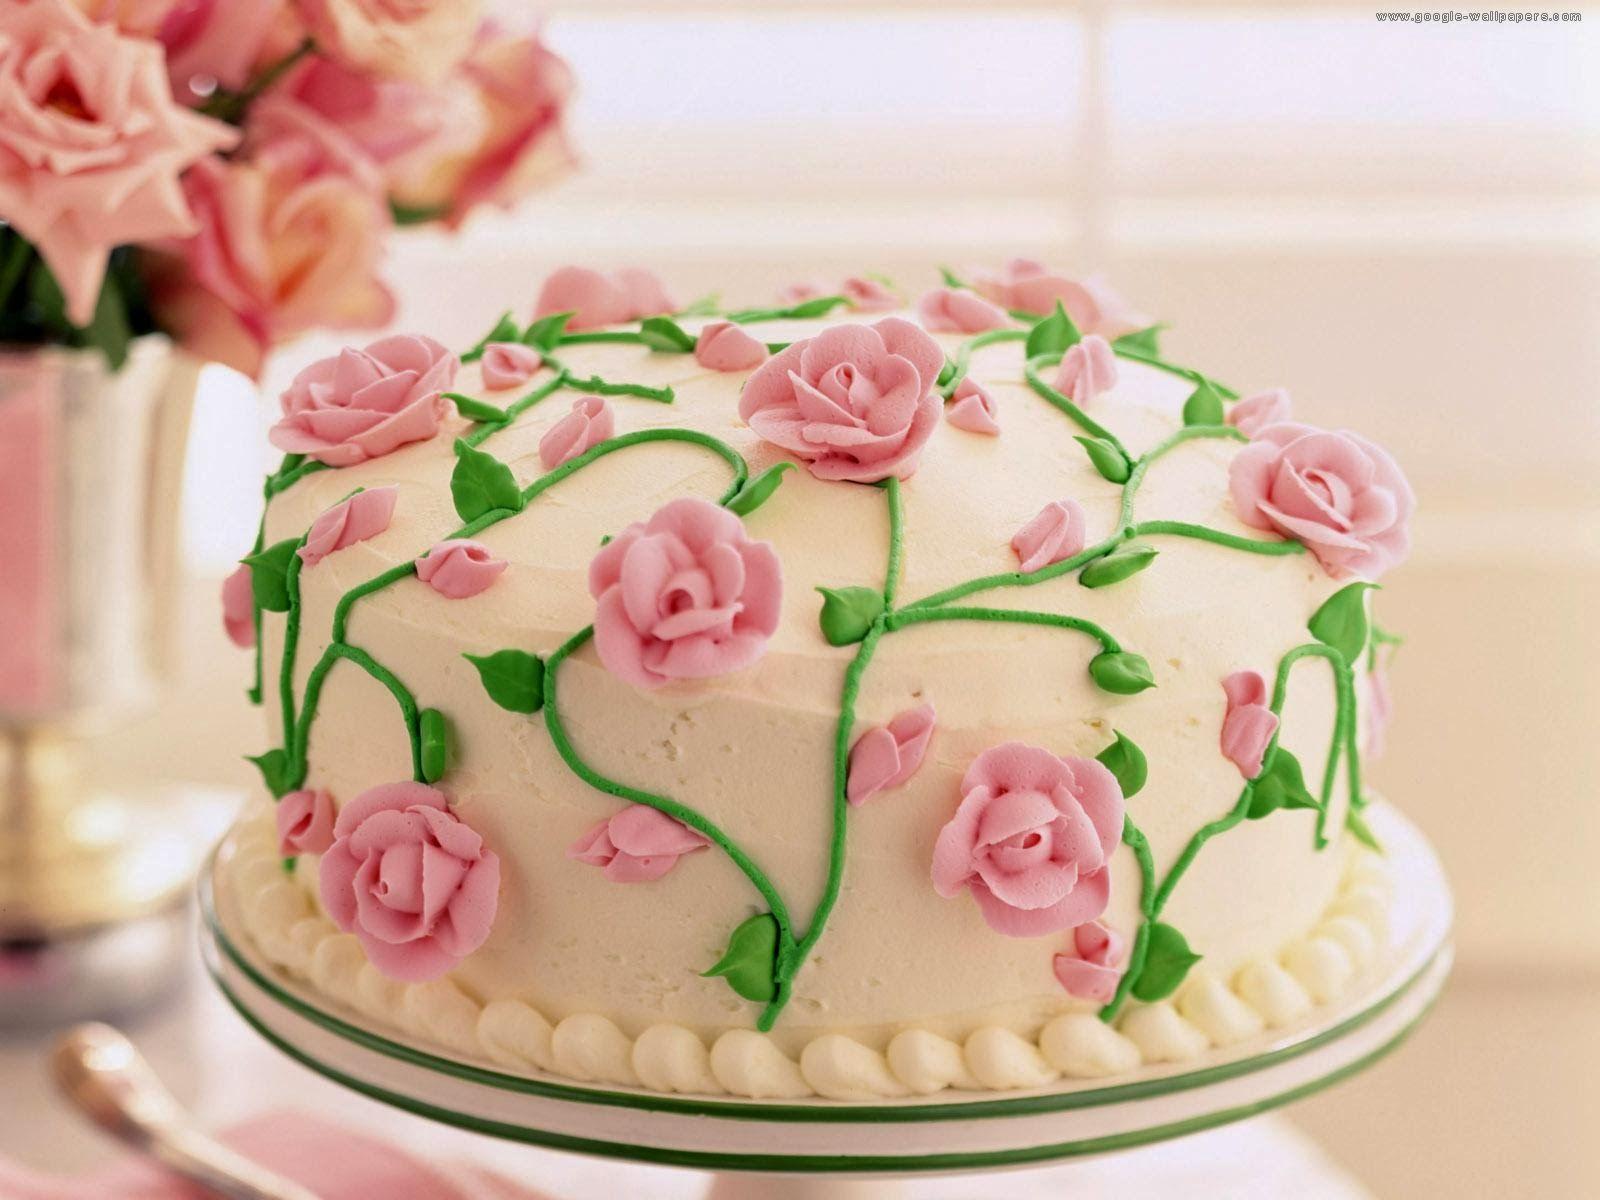 Birthday Cake Wallpaper × Pic Of Birthday Cake Wallpapers